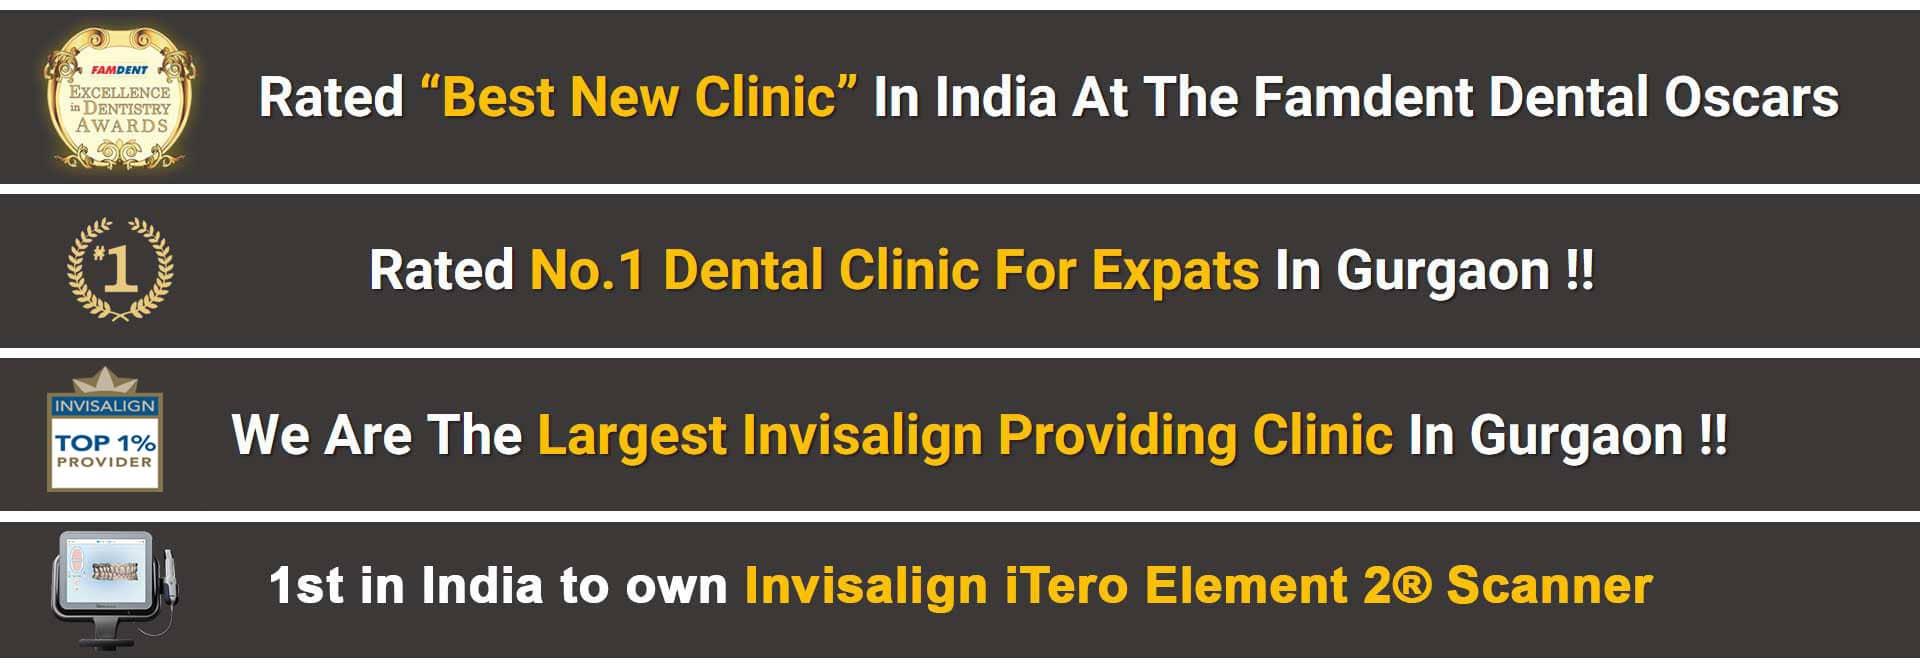 Best Dental Clinic in Gurgaon, Best Dentist in Gurgaon